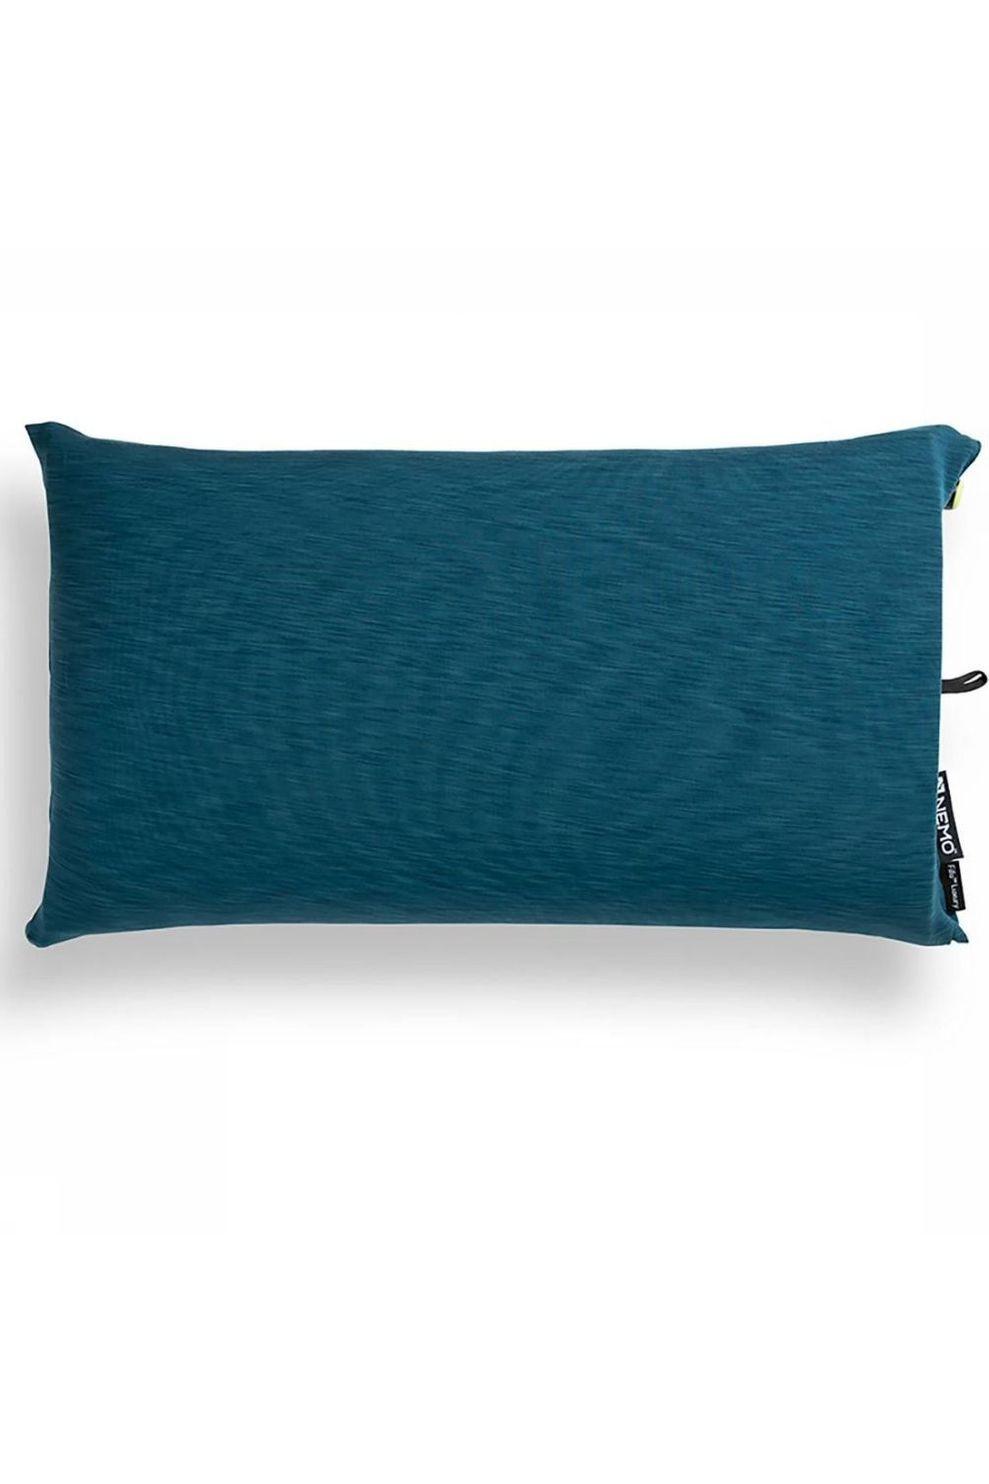 Nemo Kussen Fillo Luxury - Blauw